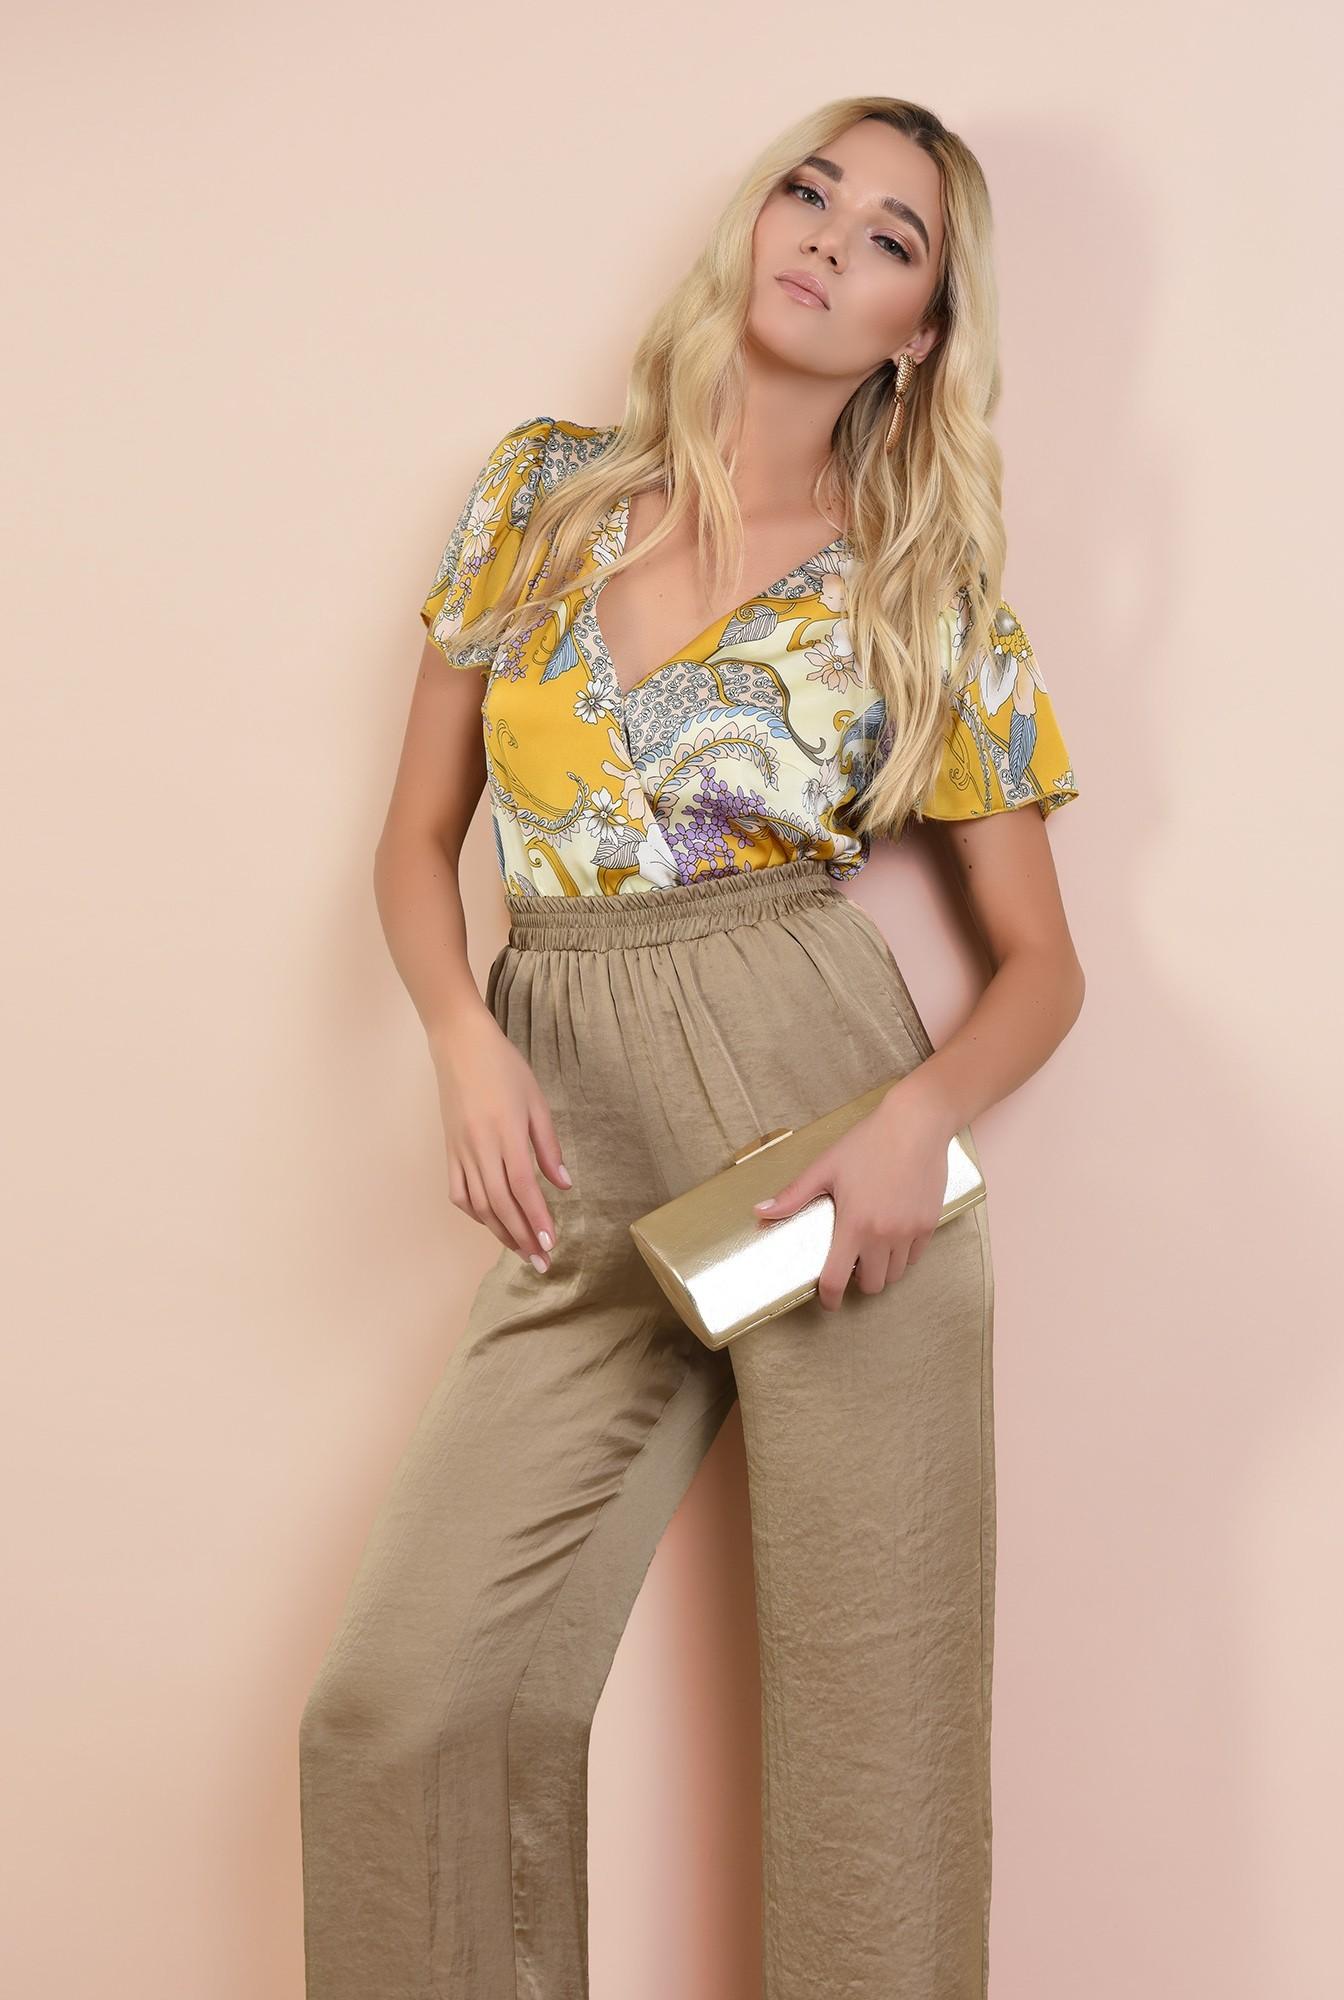 0 - bluza eleganta, din satin, cu imprimeu floral, croi lejer parte peste parte